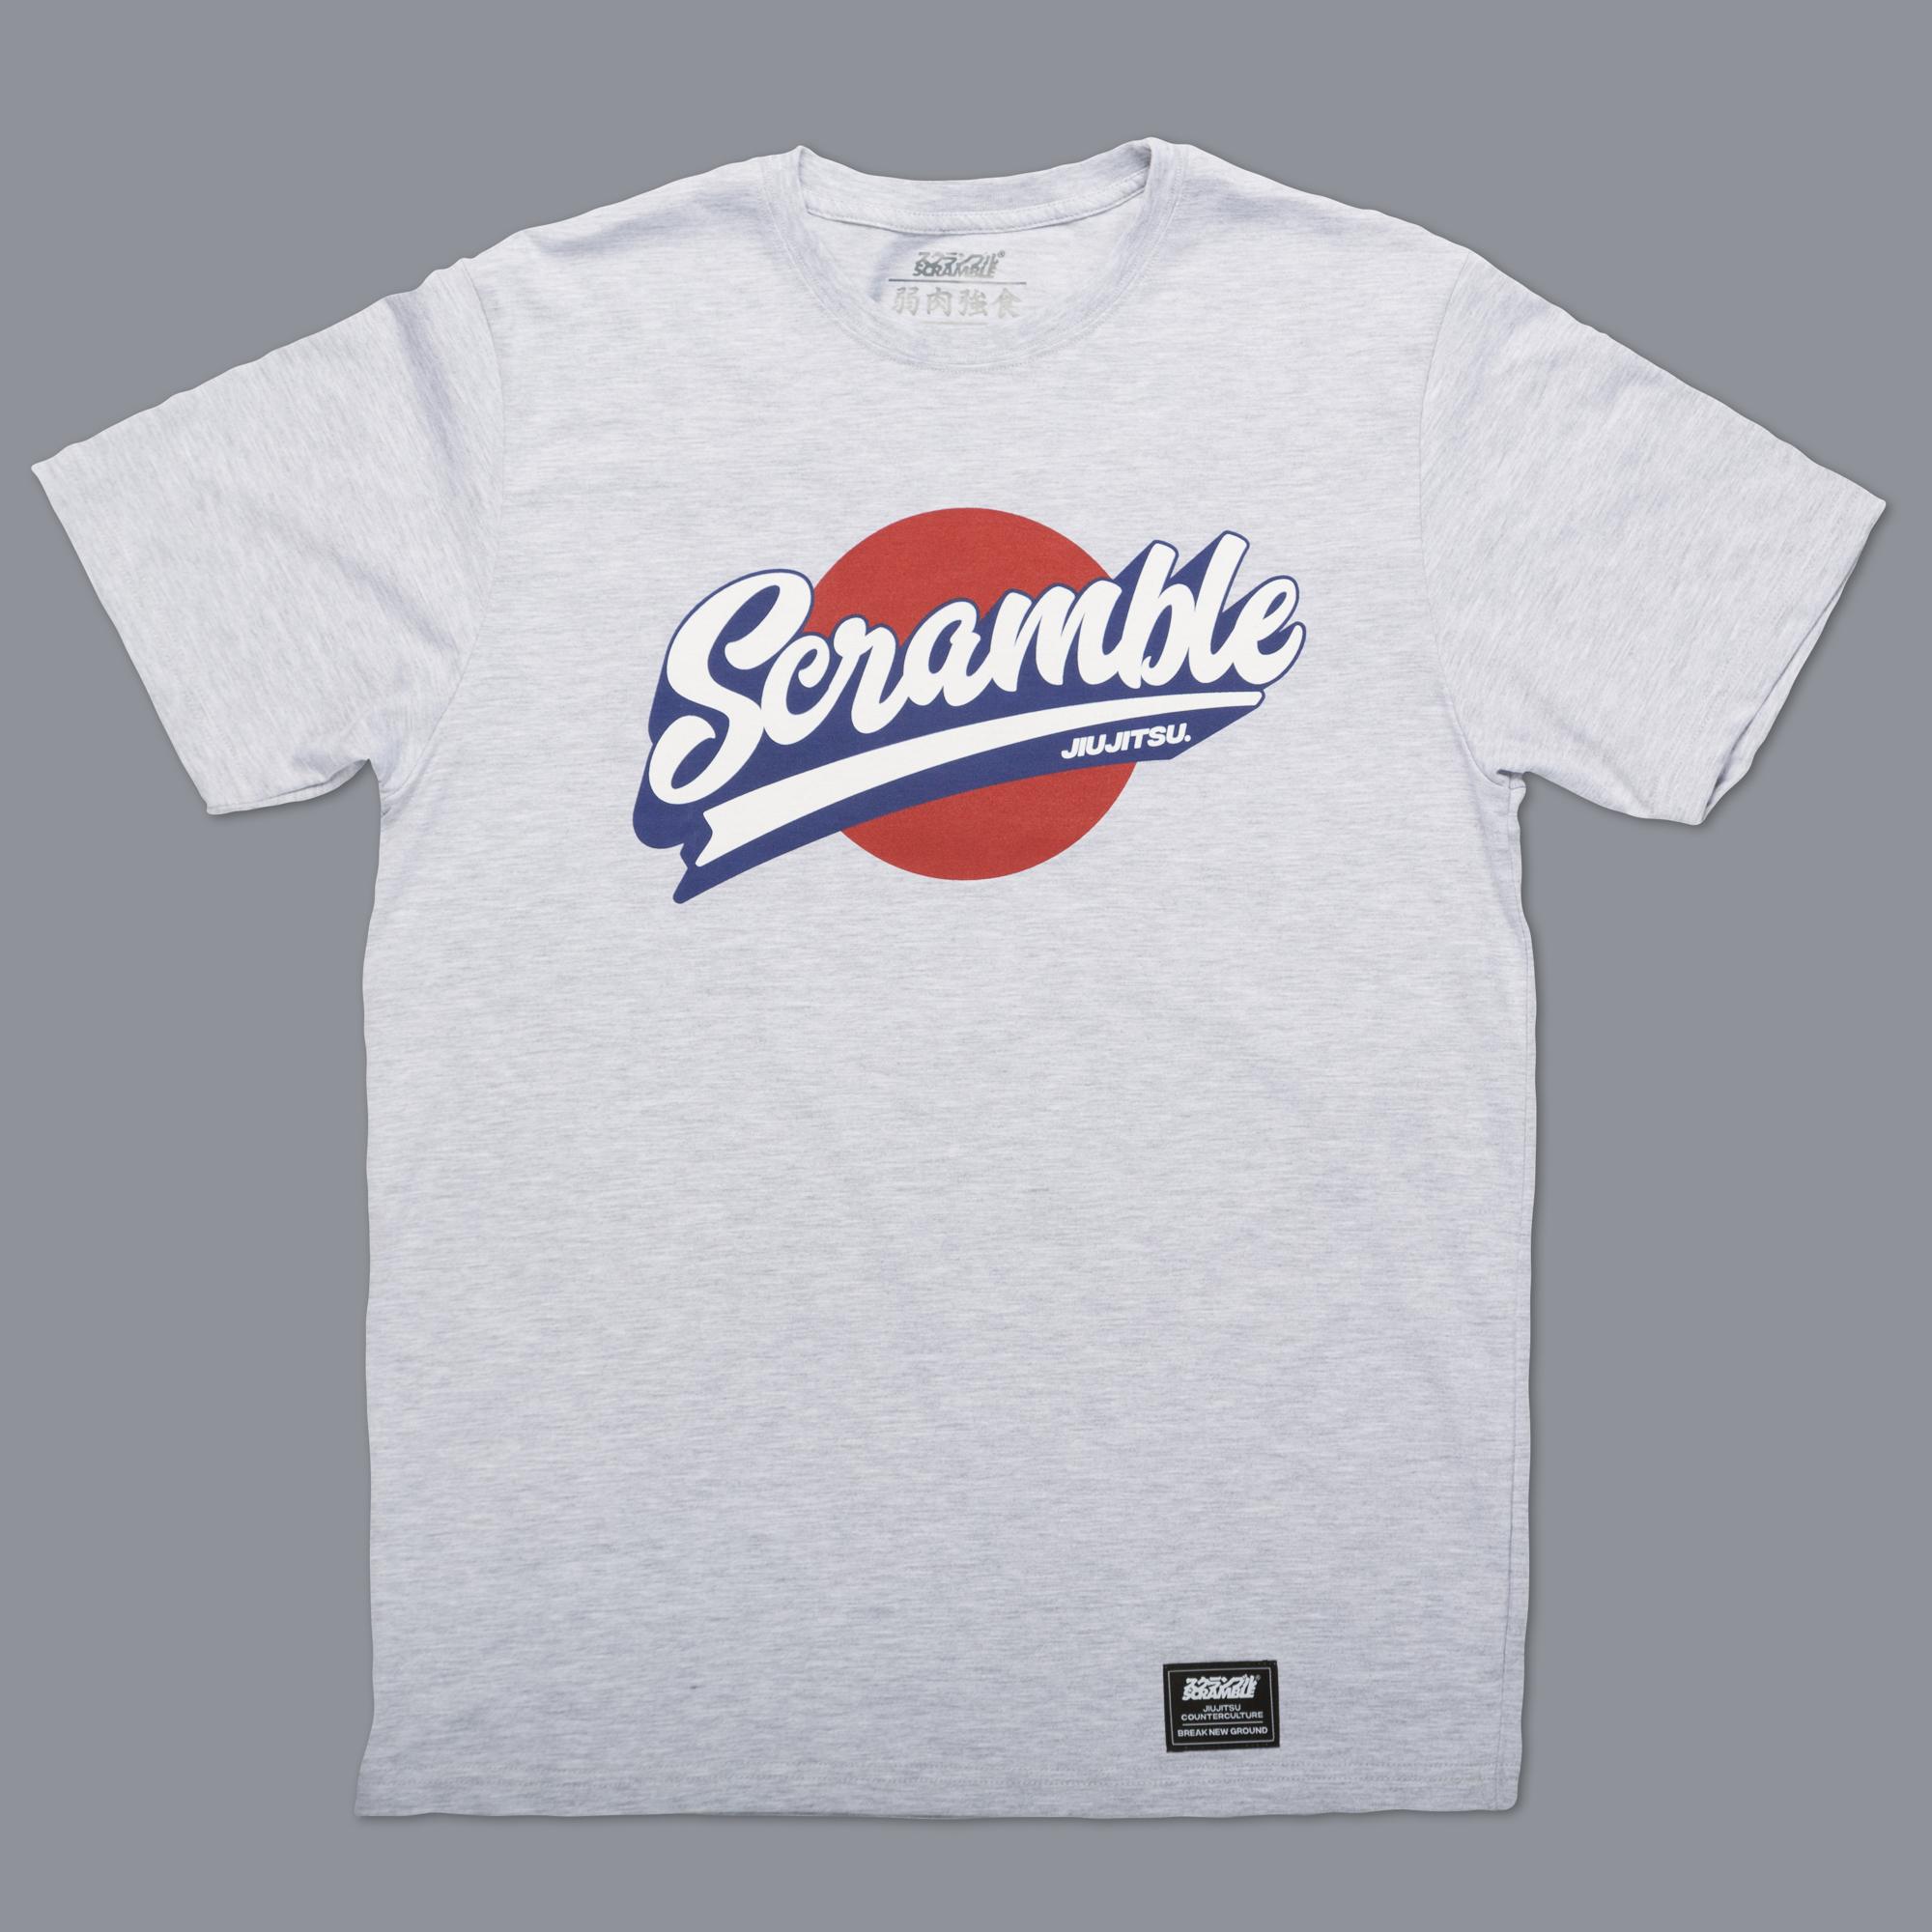 Scramble Sport Logo Tee - Grey 格闘技、柔術Tシャツ